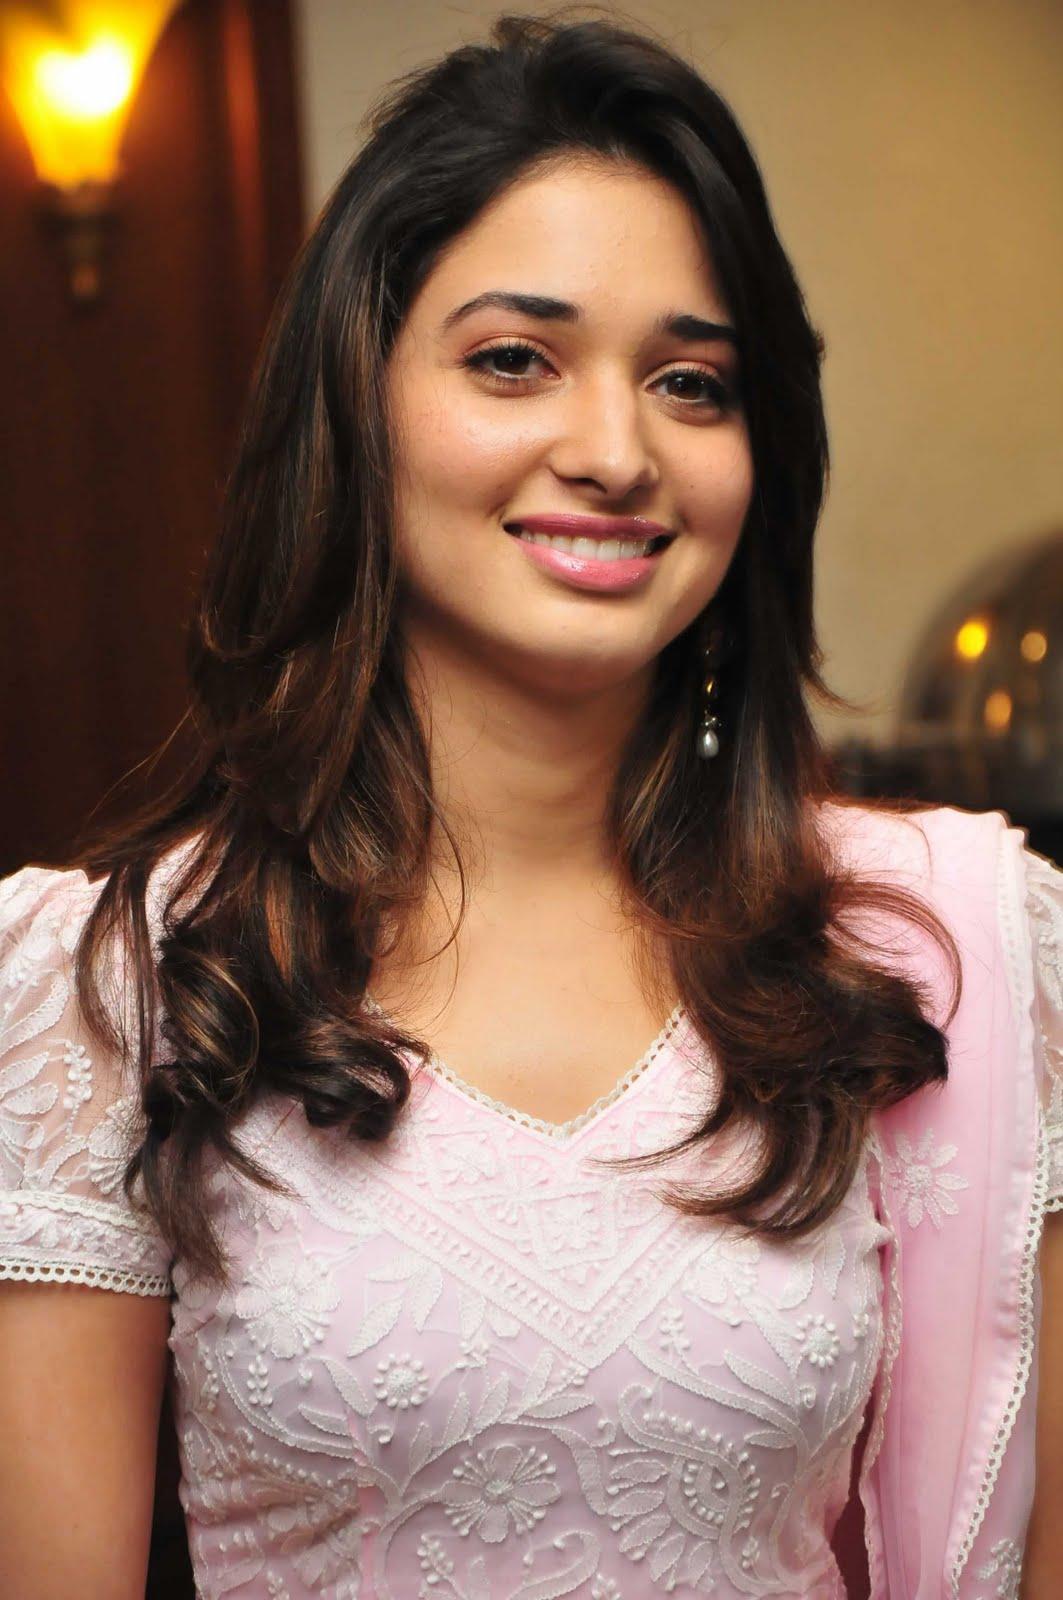 Latest Tamanna In Saree: Fashion Models And Actress: Tamanna Latest Stills